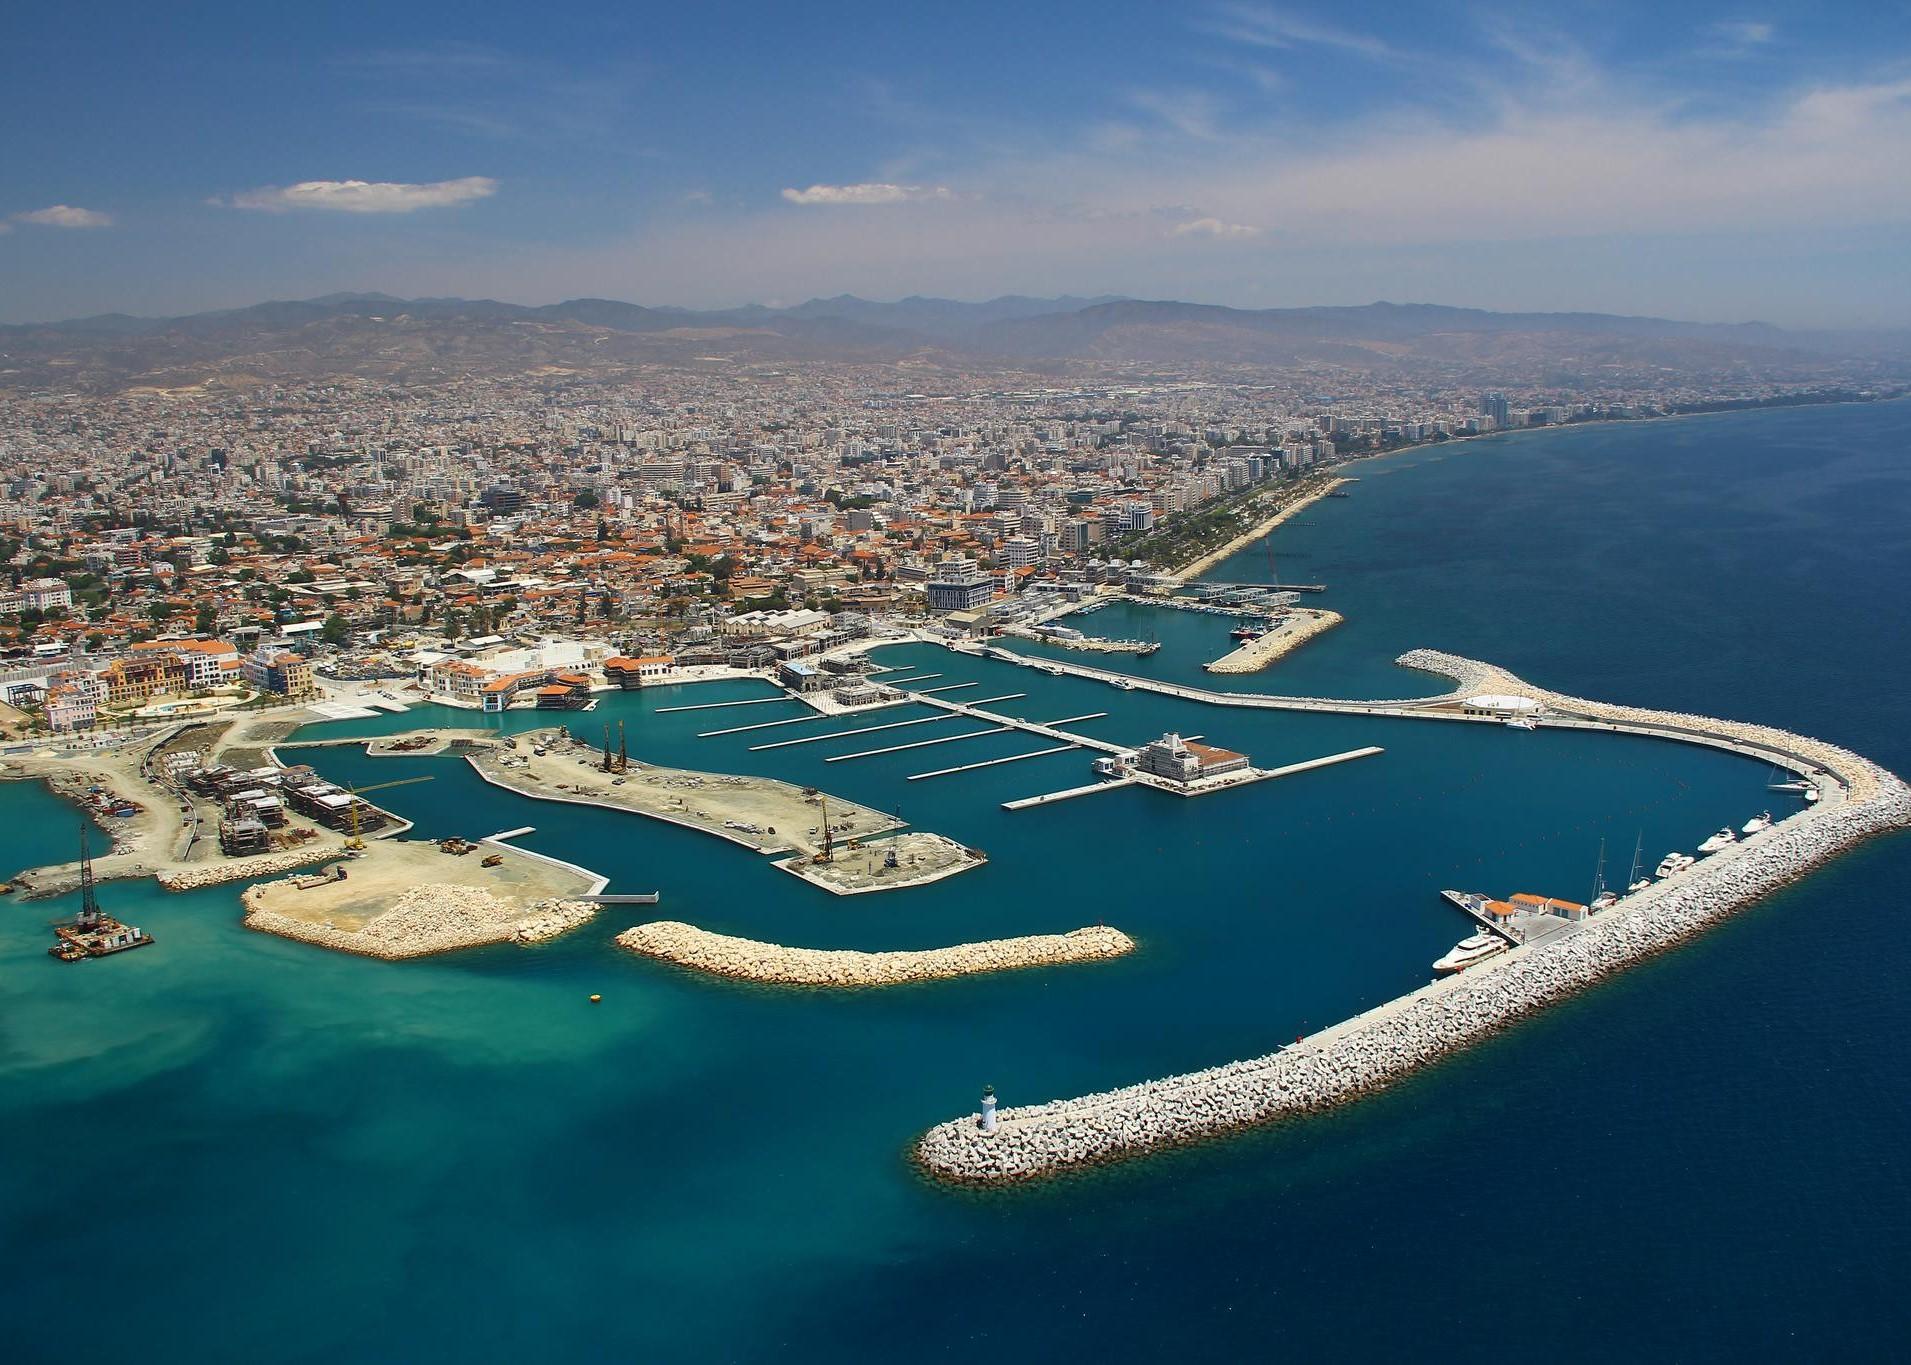 Города на острове Кипр